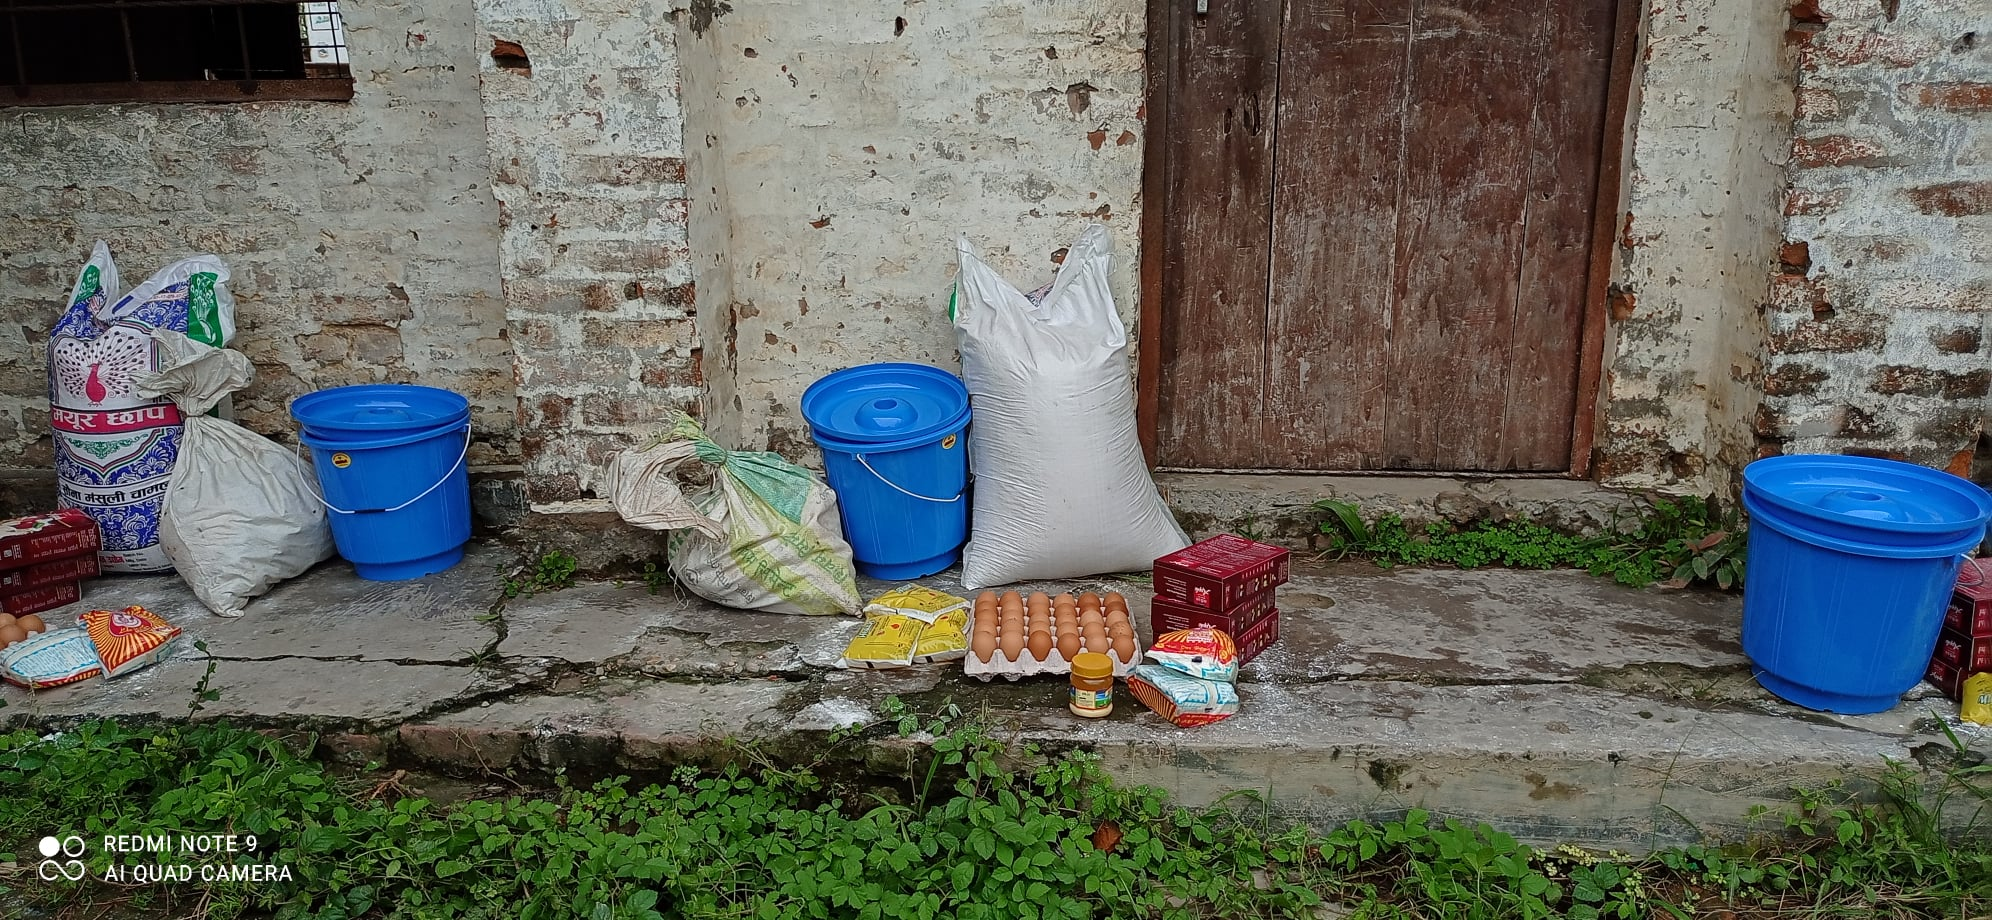 food-distribution-program-for-children-HHs-at-Rajpur-municipality-Rautahat-04